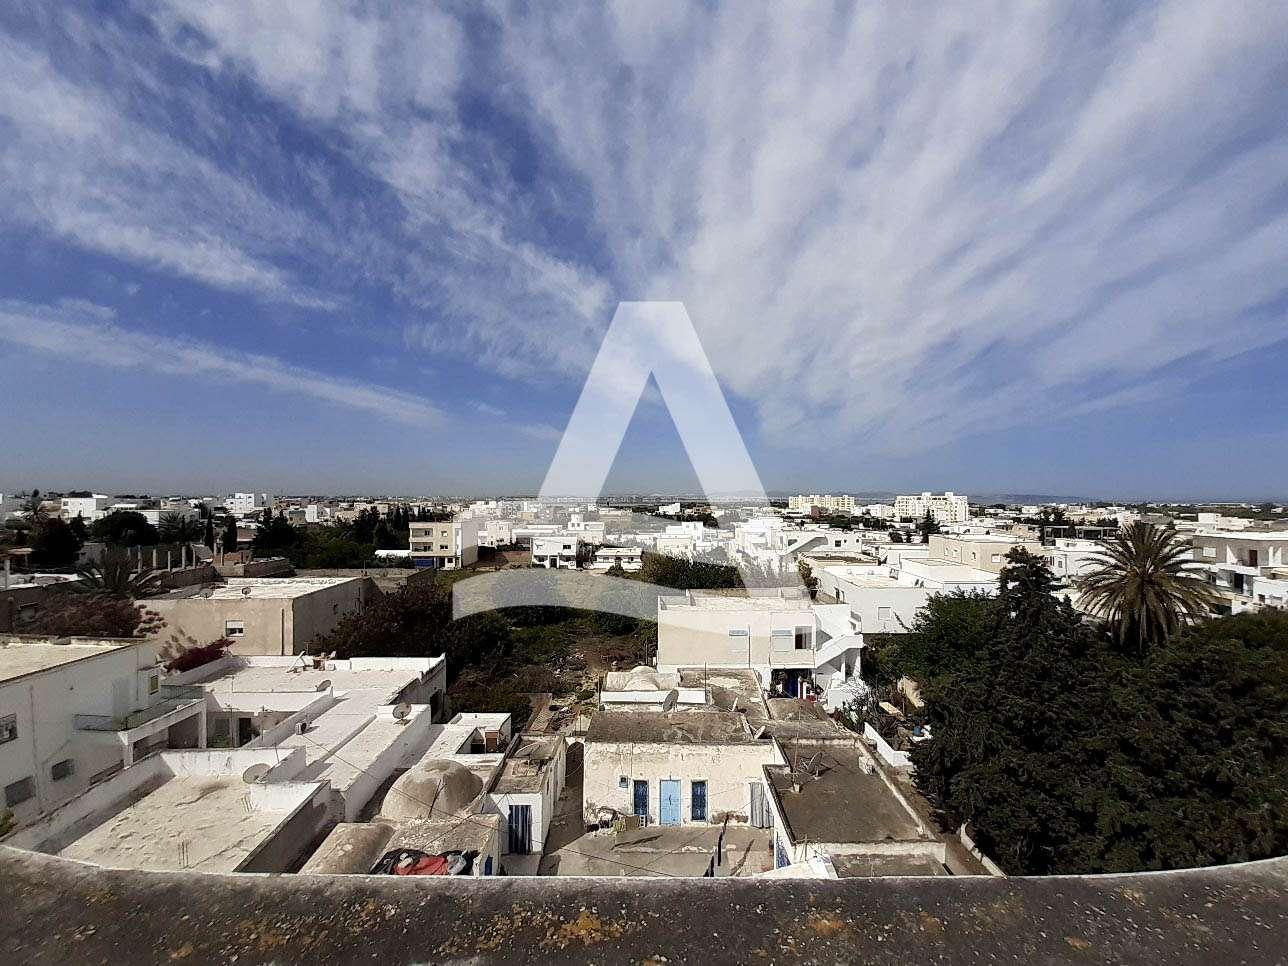 httpss3.amazonaws.comlogimoaws19115692271619689734Appartement_Marsa_Tunisie_